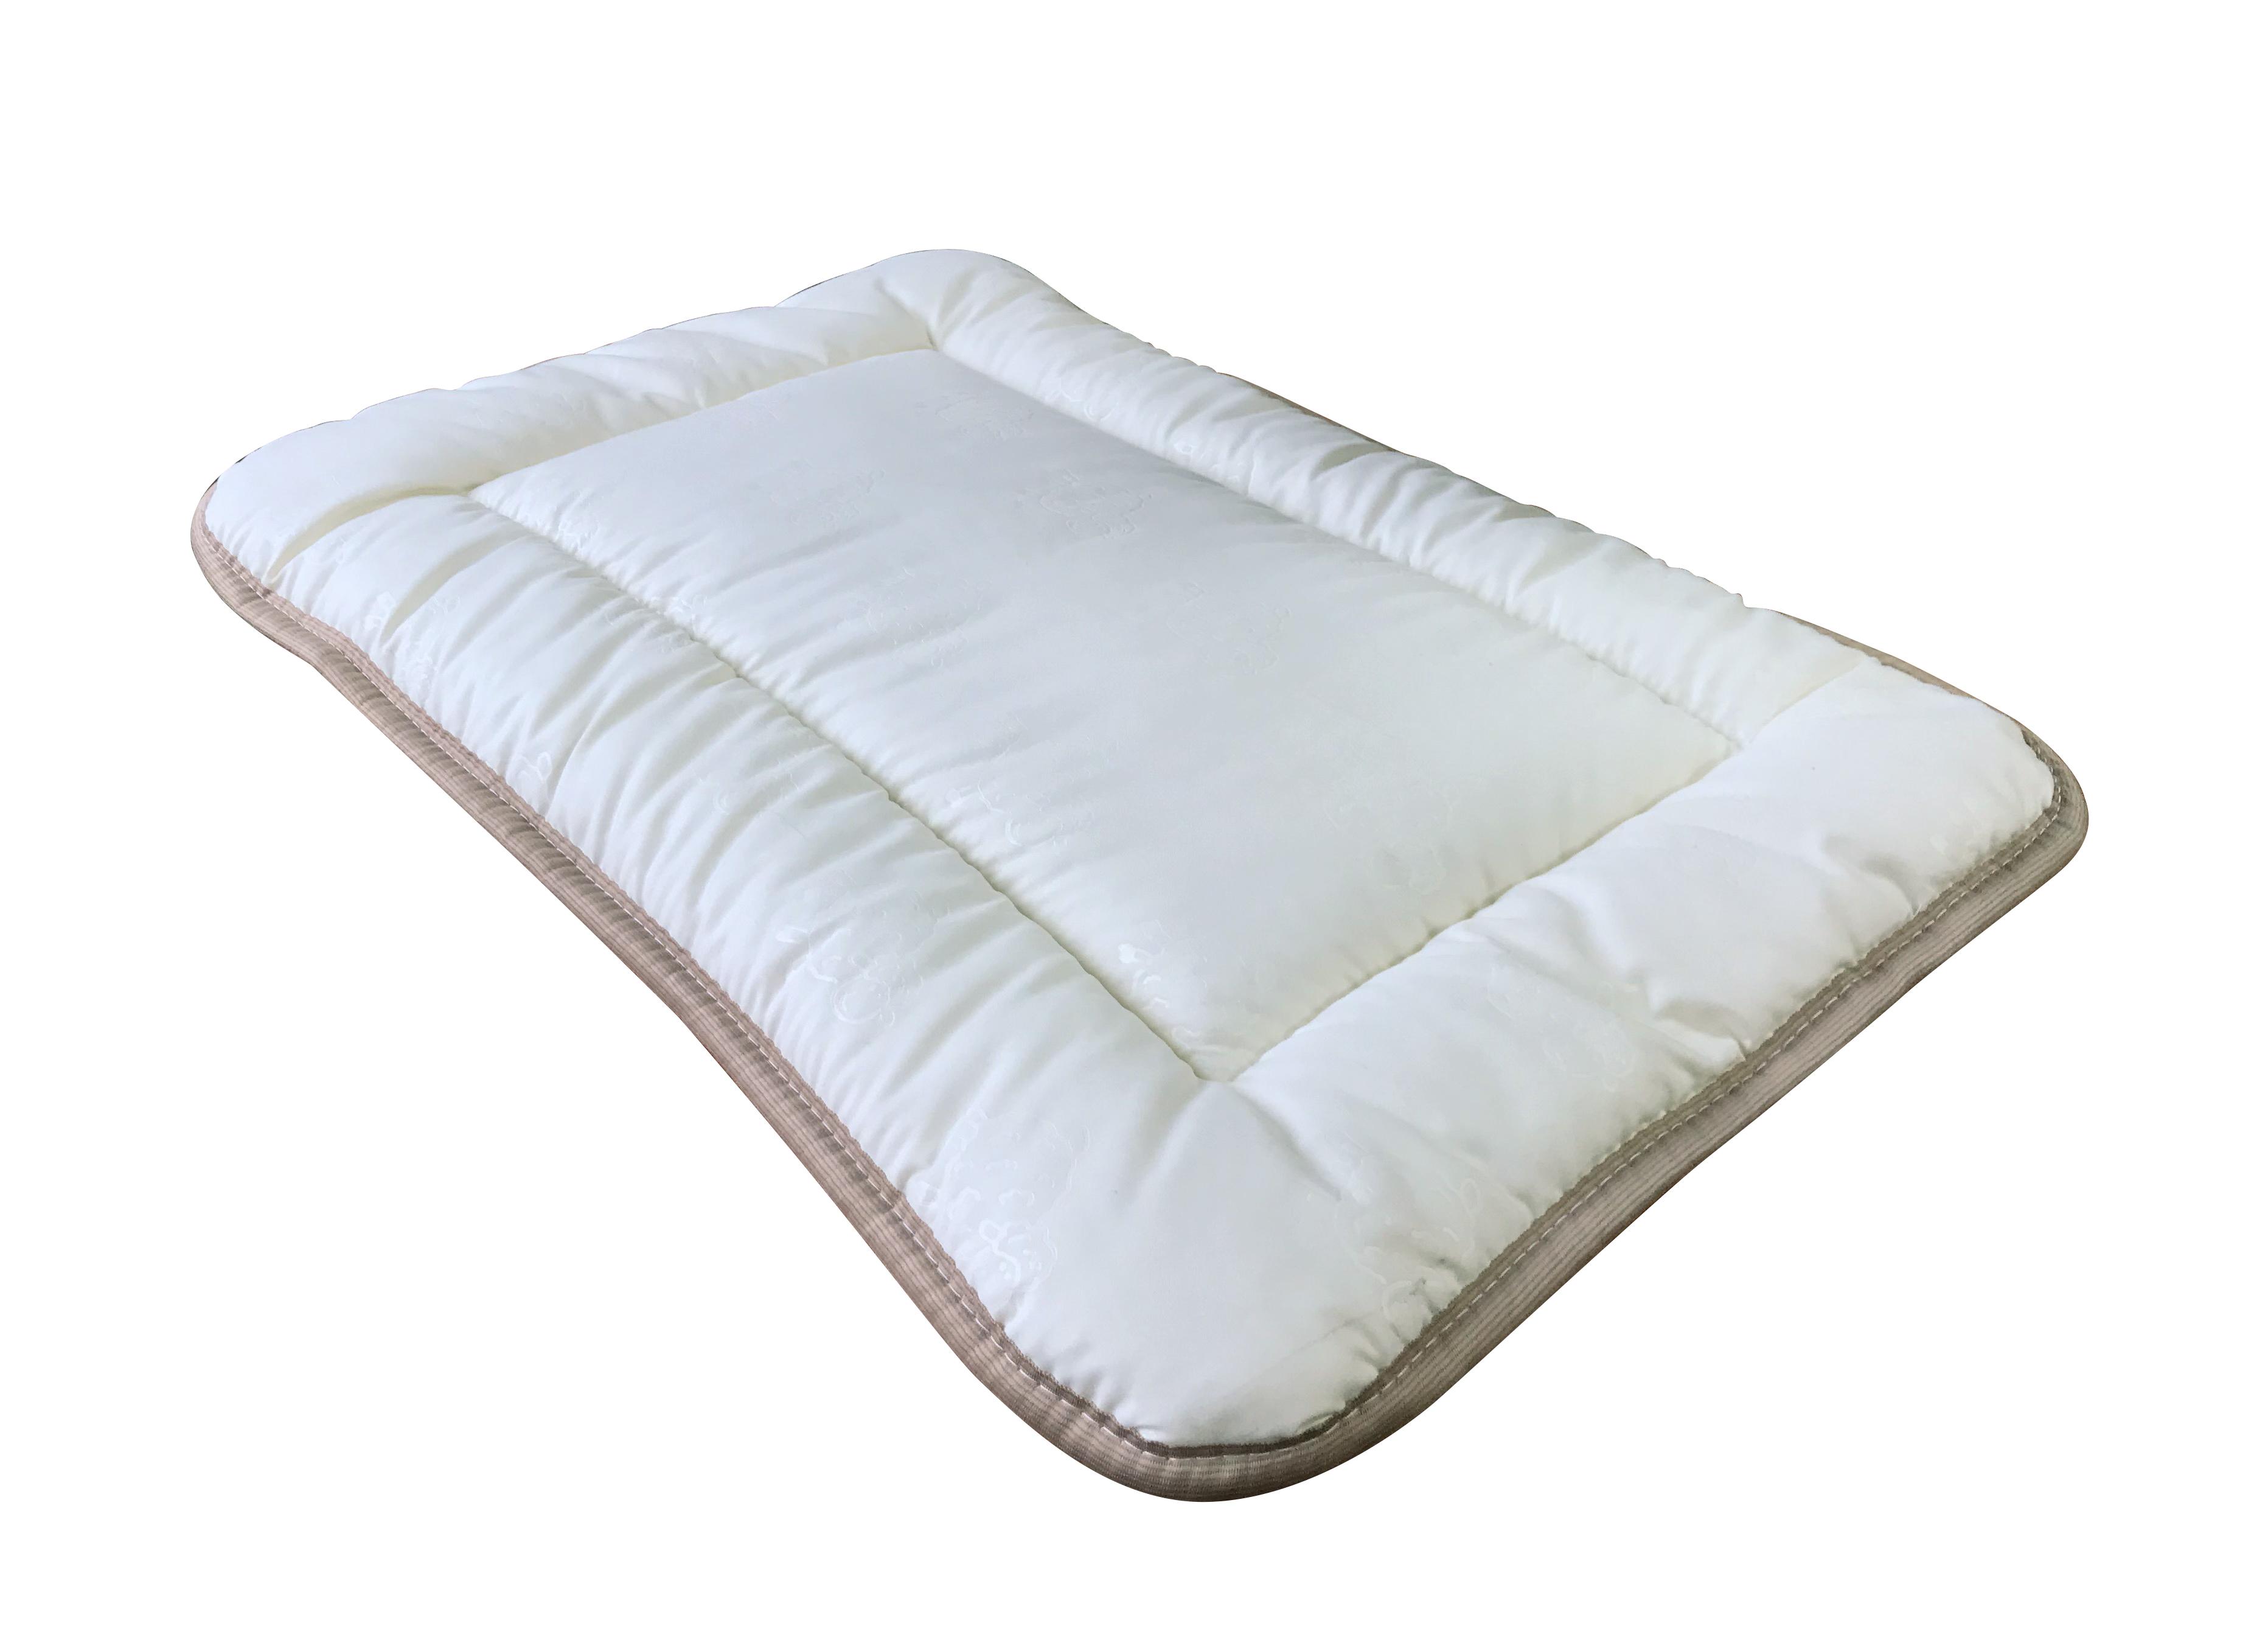 pillow-cassia-grandis-kids-214779-1